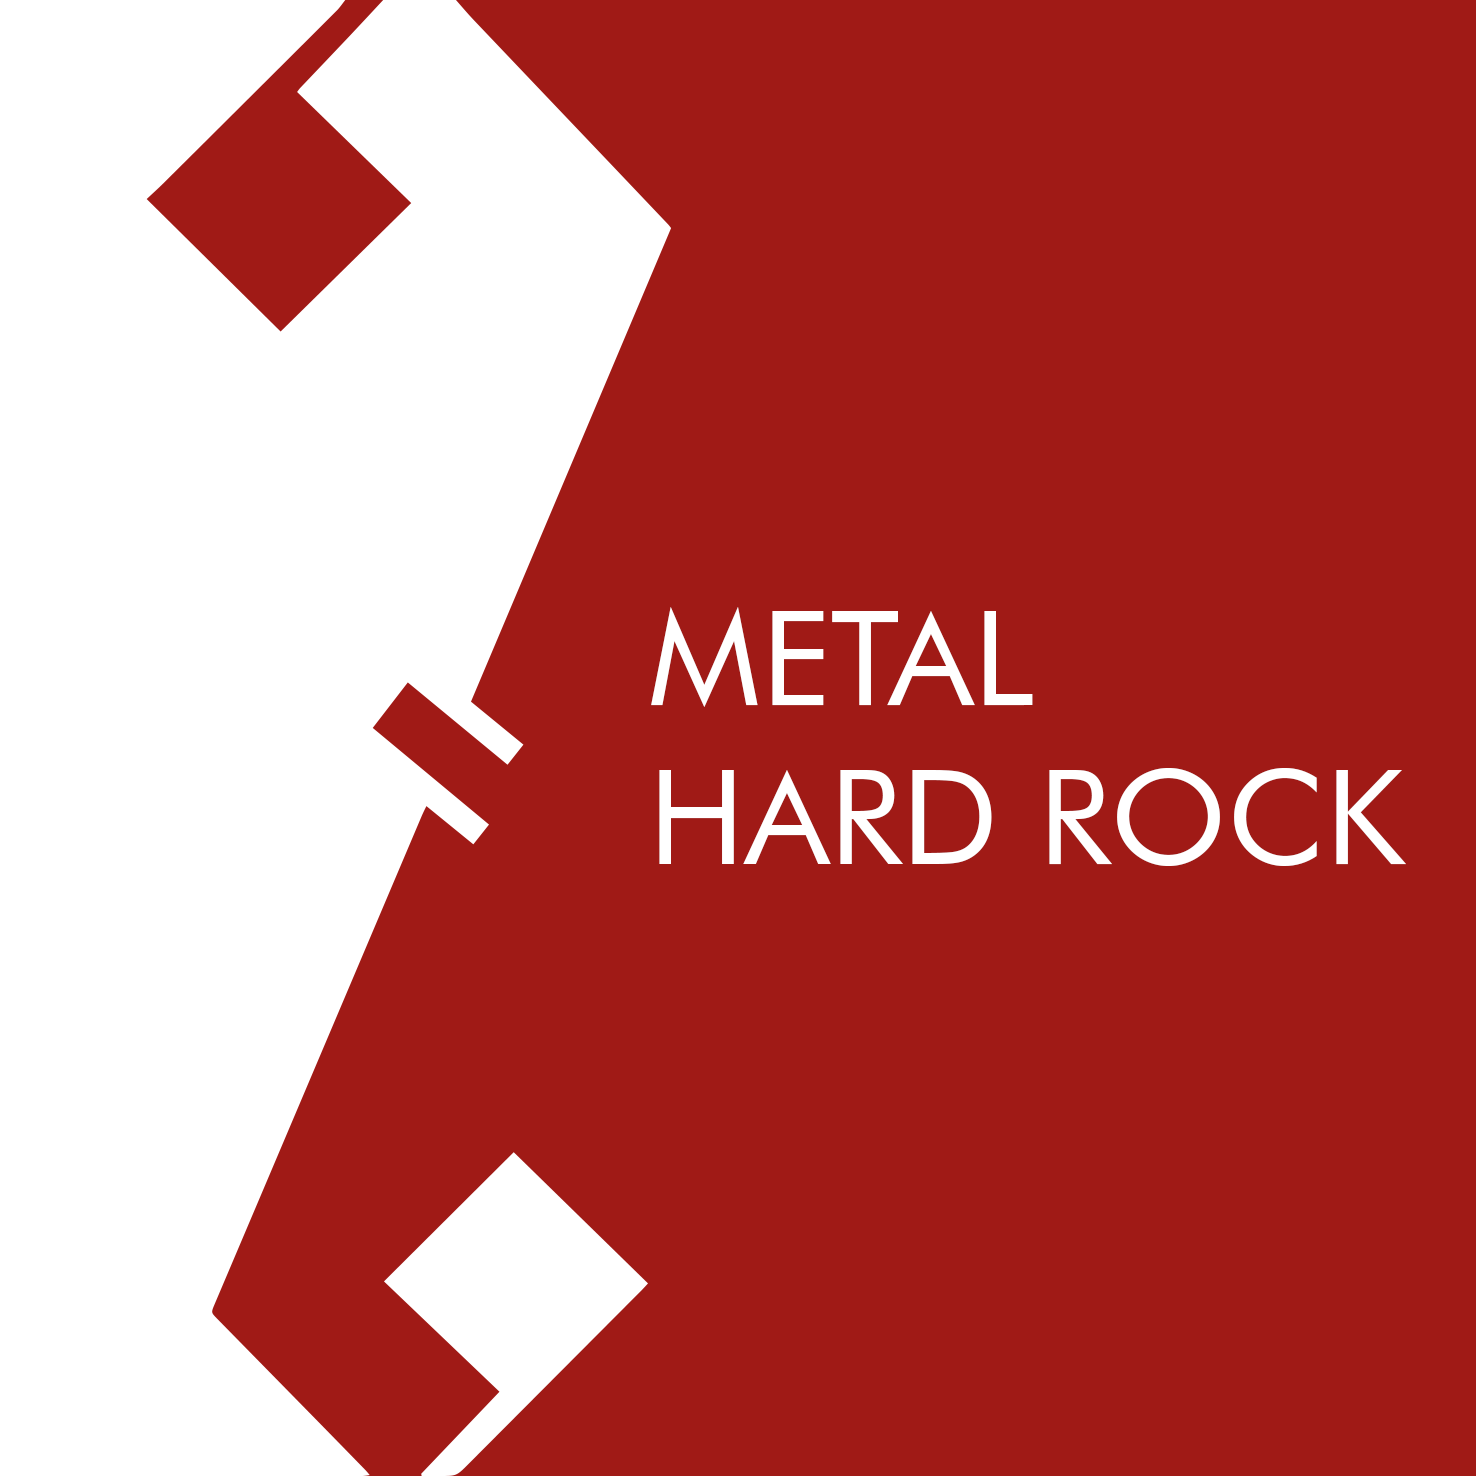 METAL - HARD ROCK